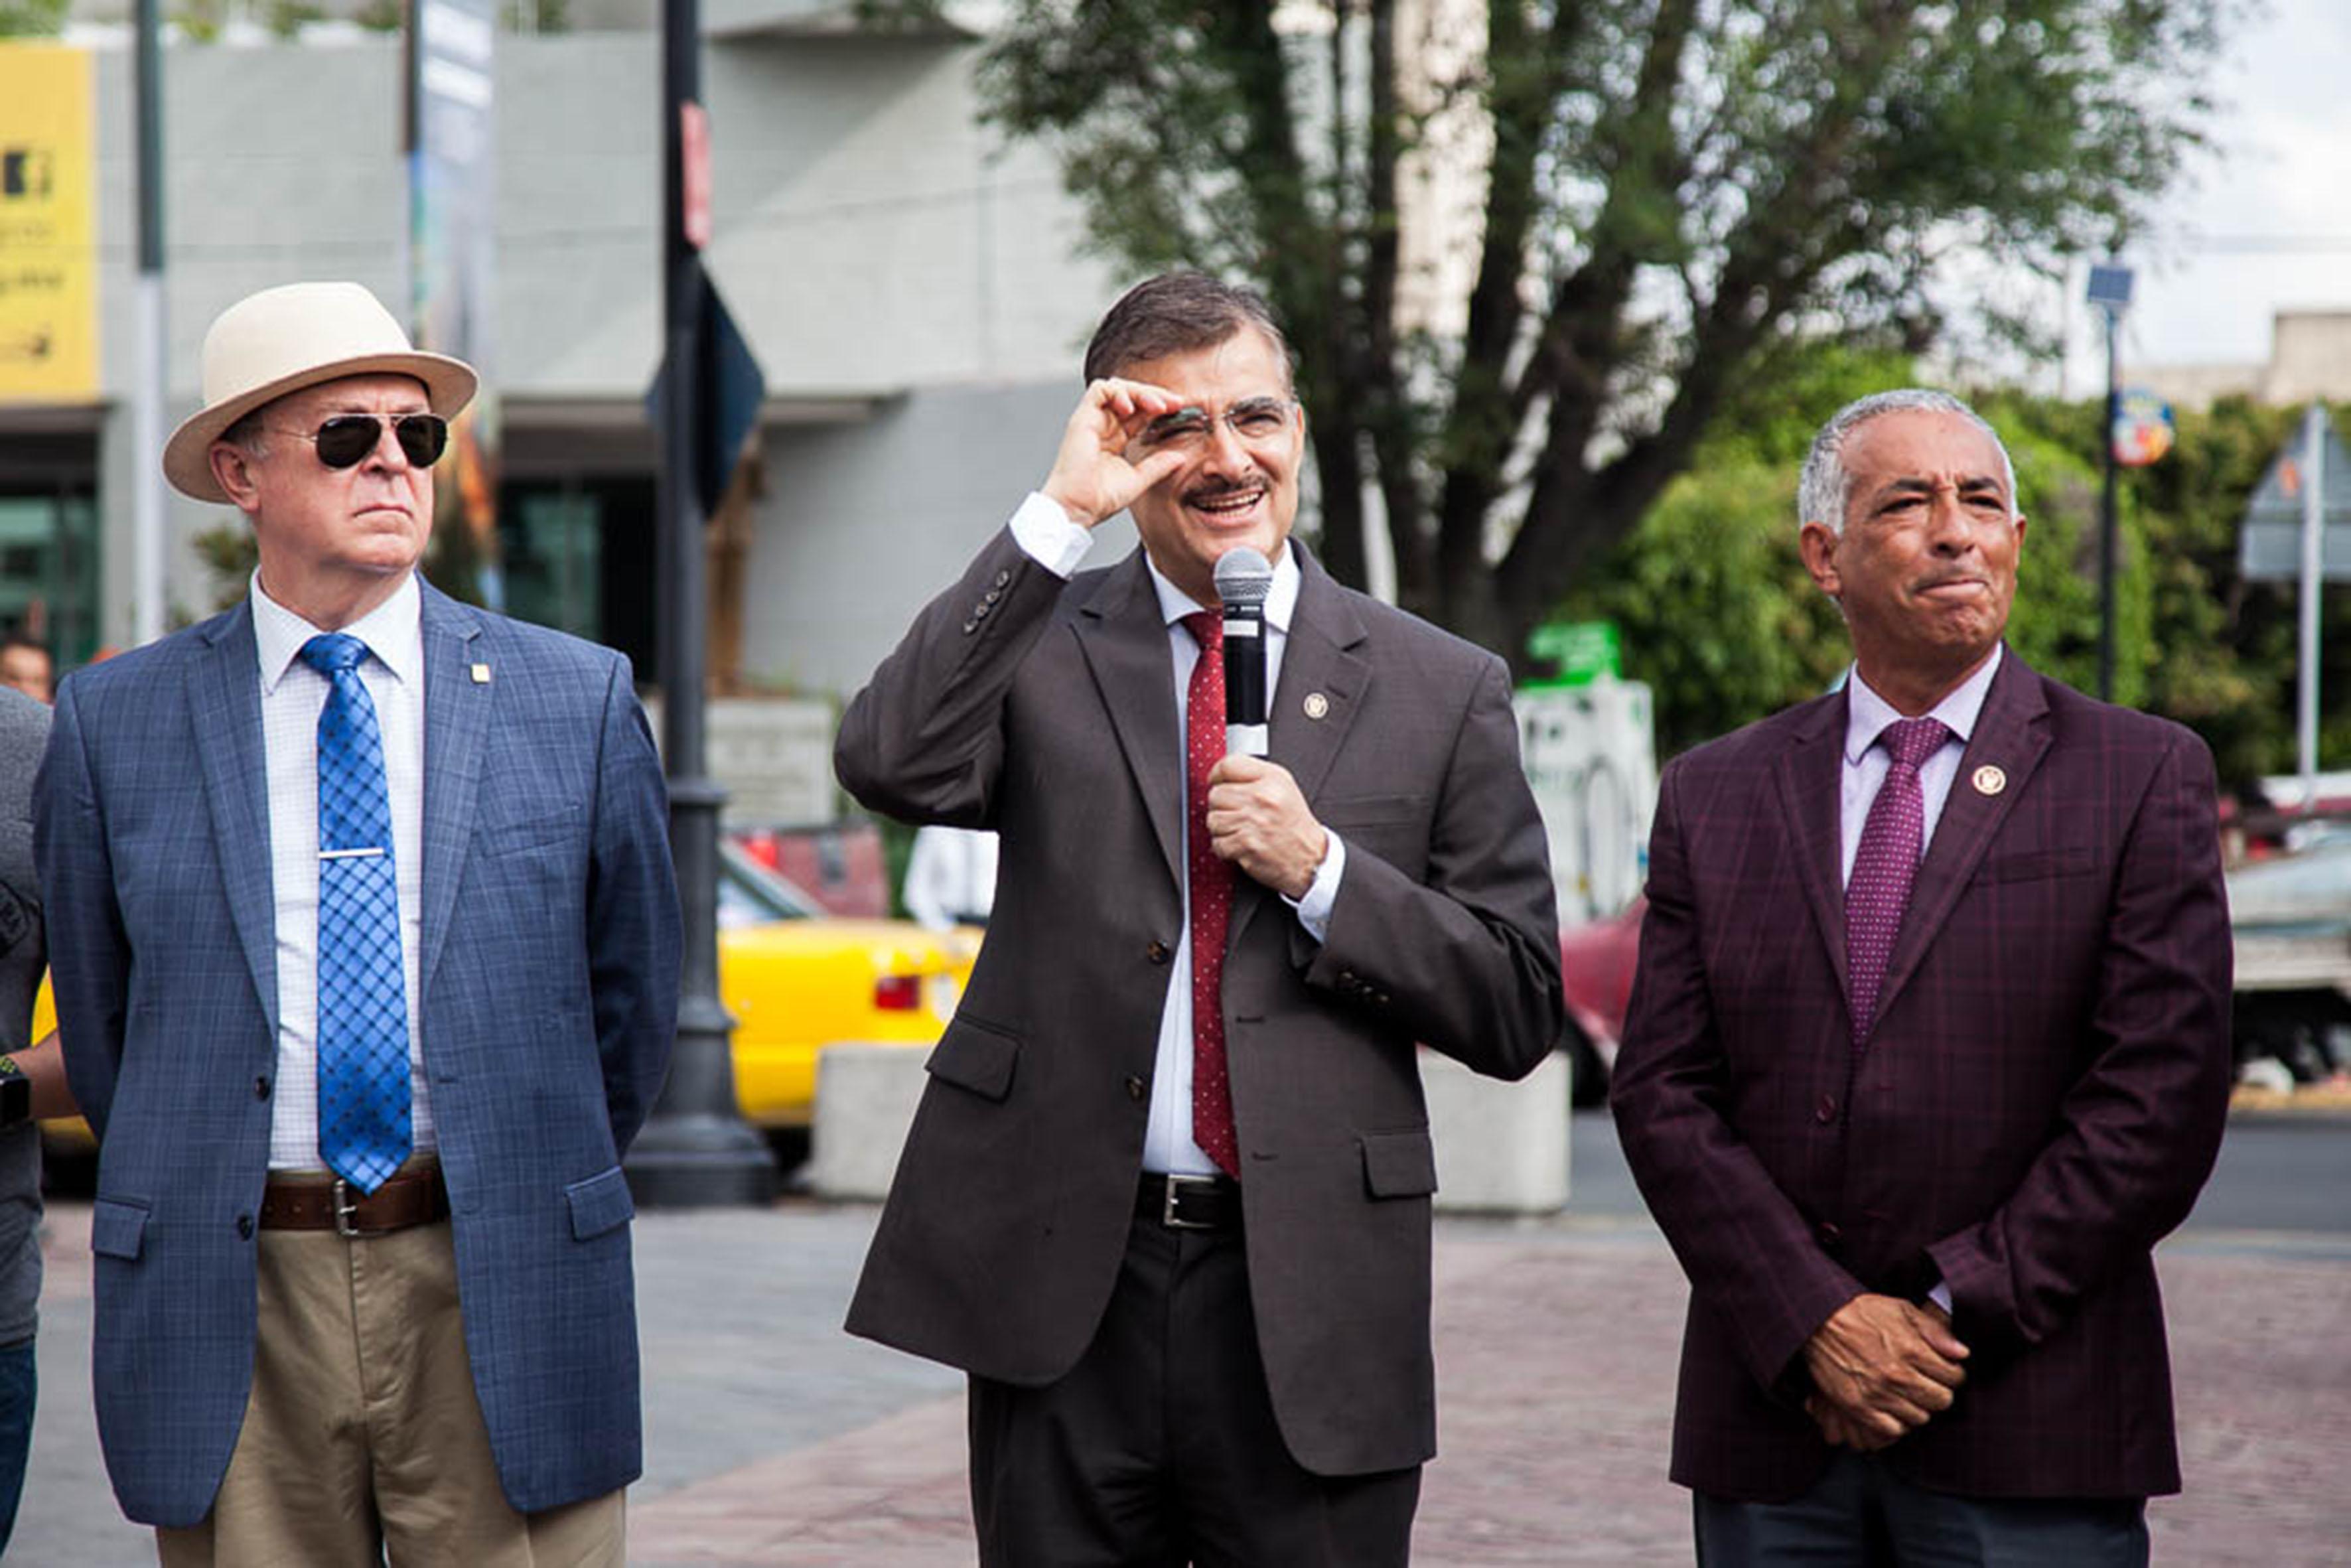 Rector General de la Universidad de Guadalajara (UdeG), maestro Itzcóatl Tonatiuh Bravo Padilla, haciendo uso de la palabra